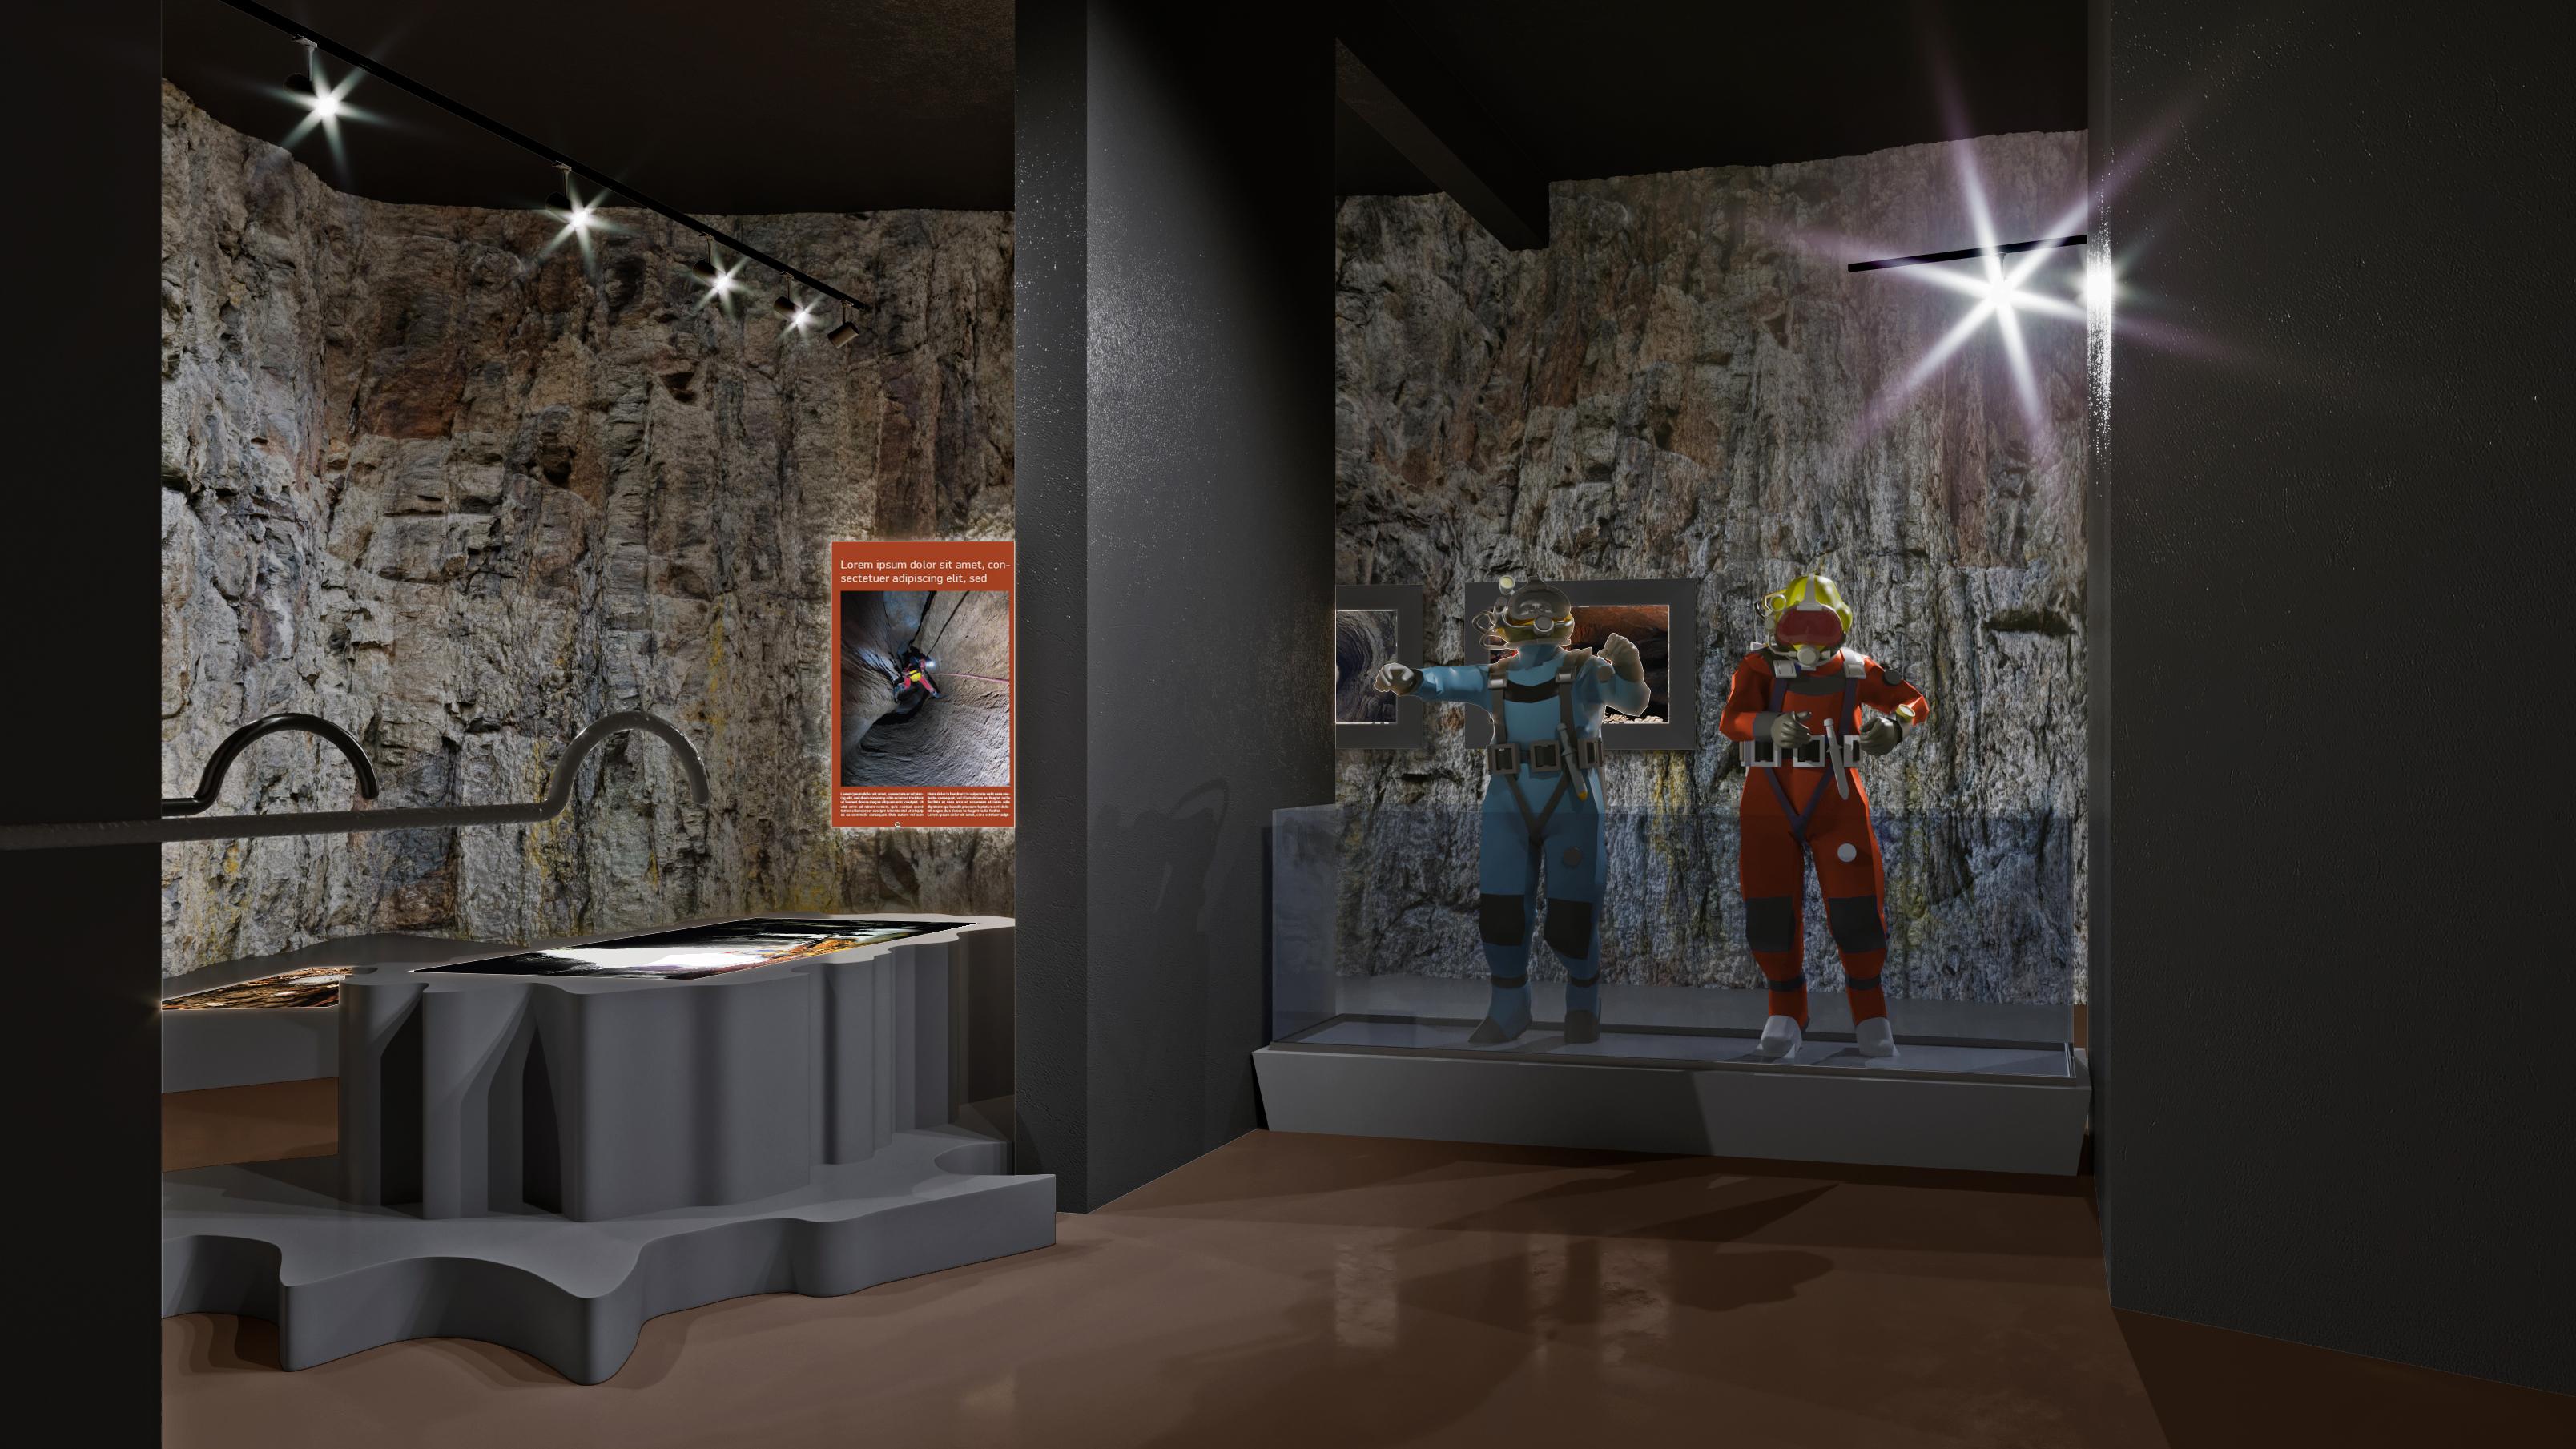 izložbeni postav speleologije